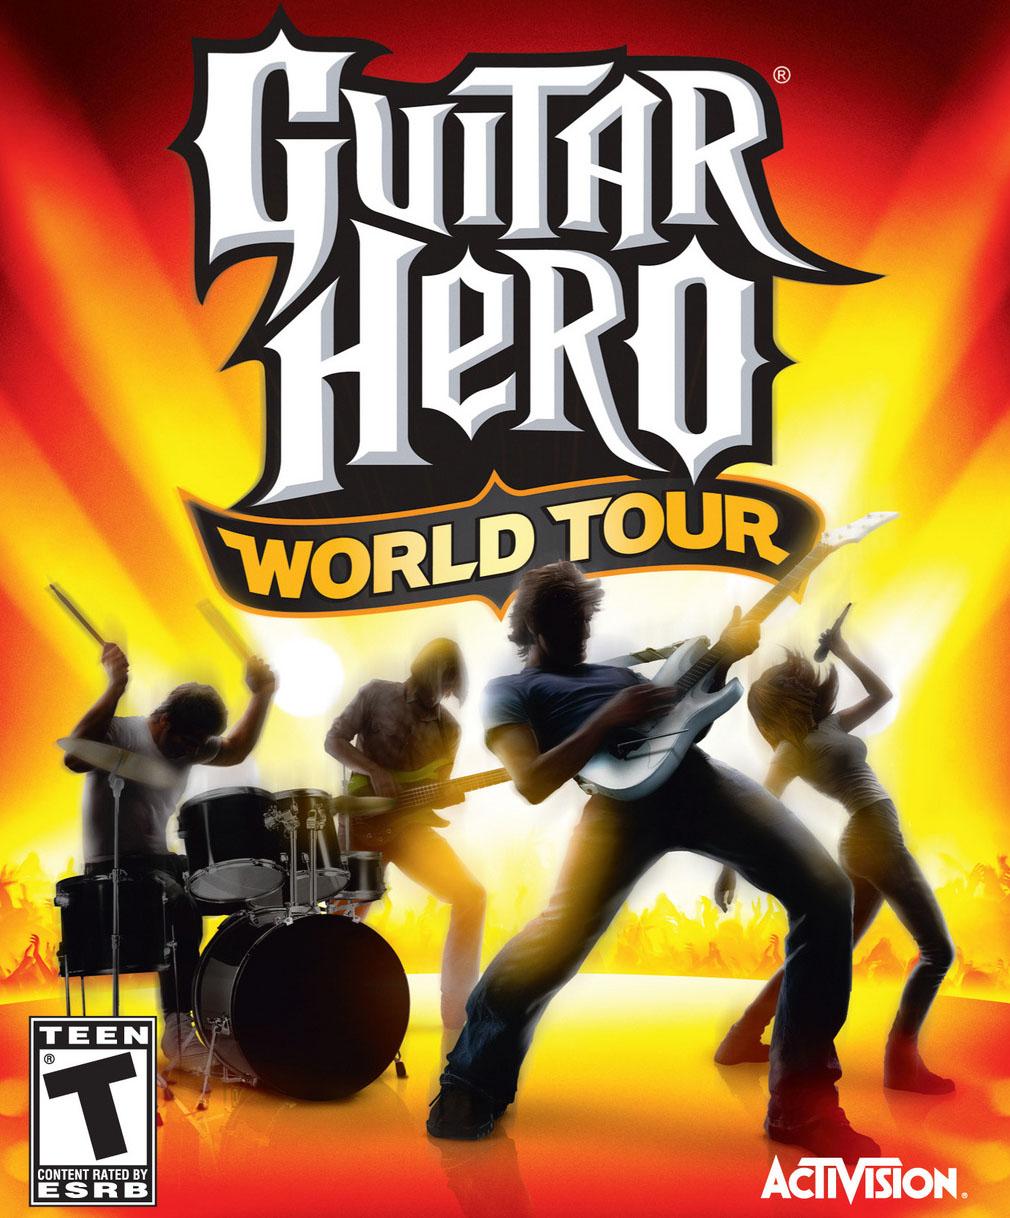 Guitar hero picture 94